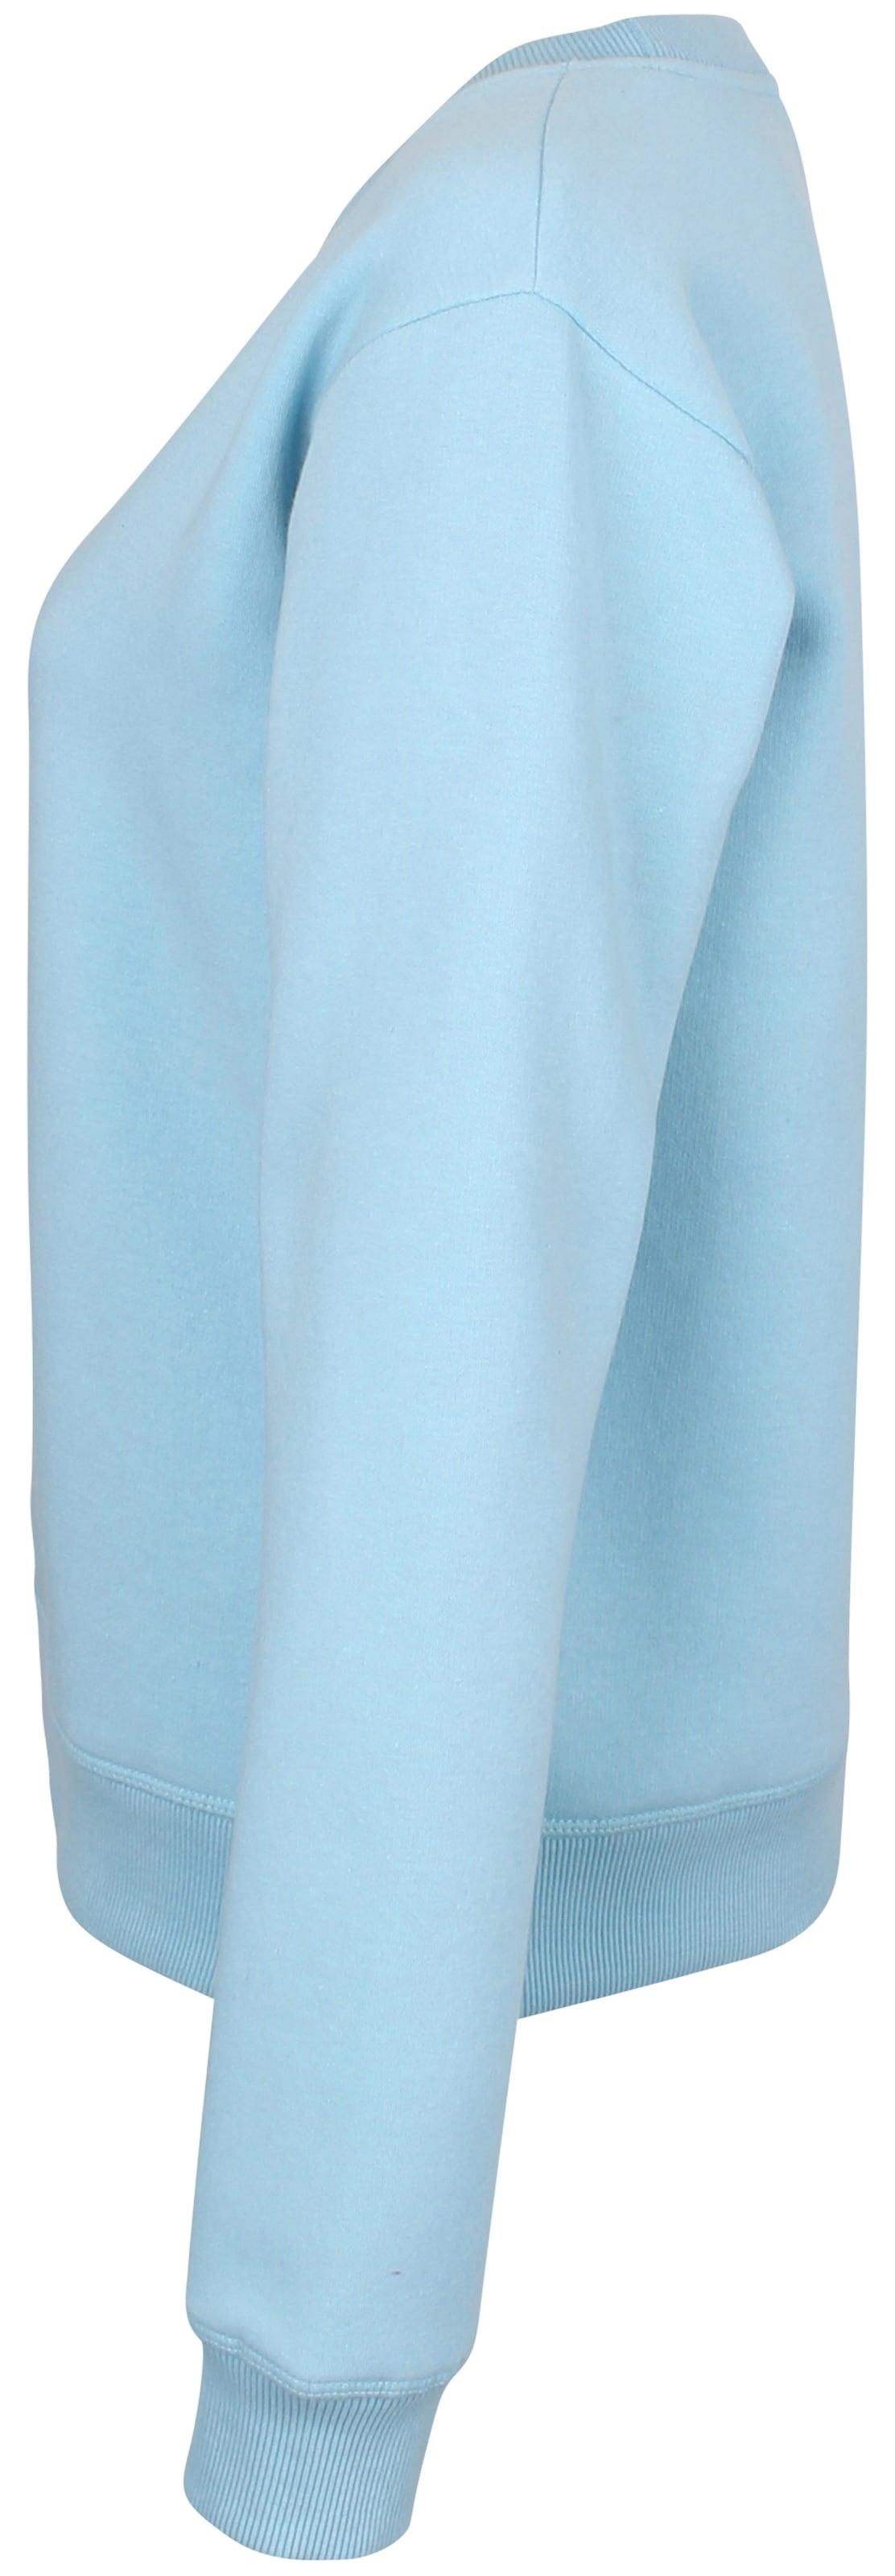 Mymo Hellblau Mymo Sweater Hellblau In In Sweater MzjqSGLUVp